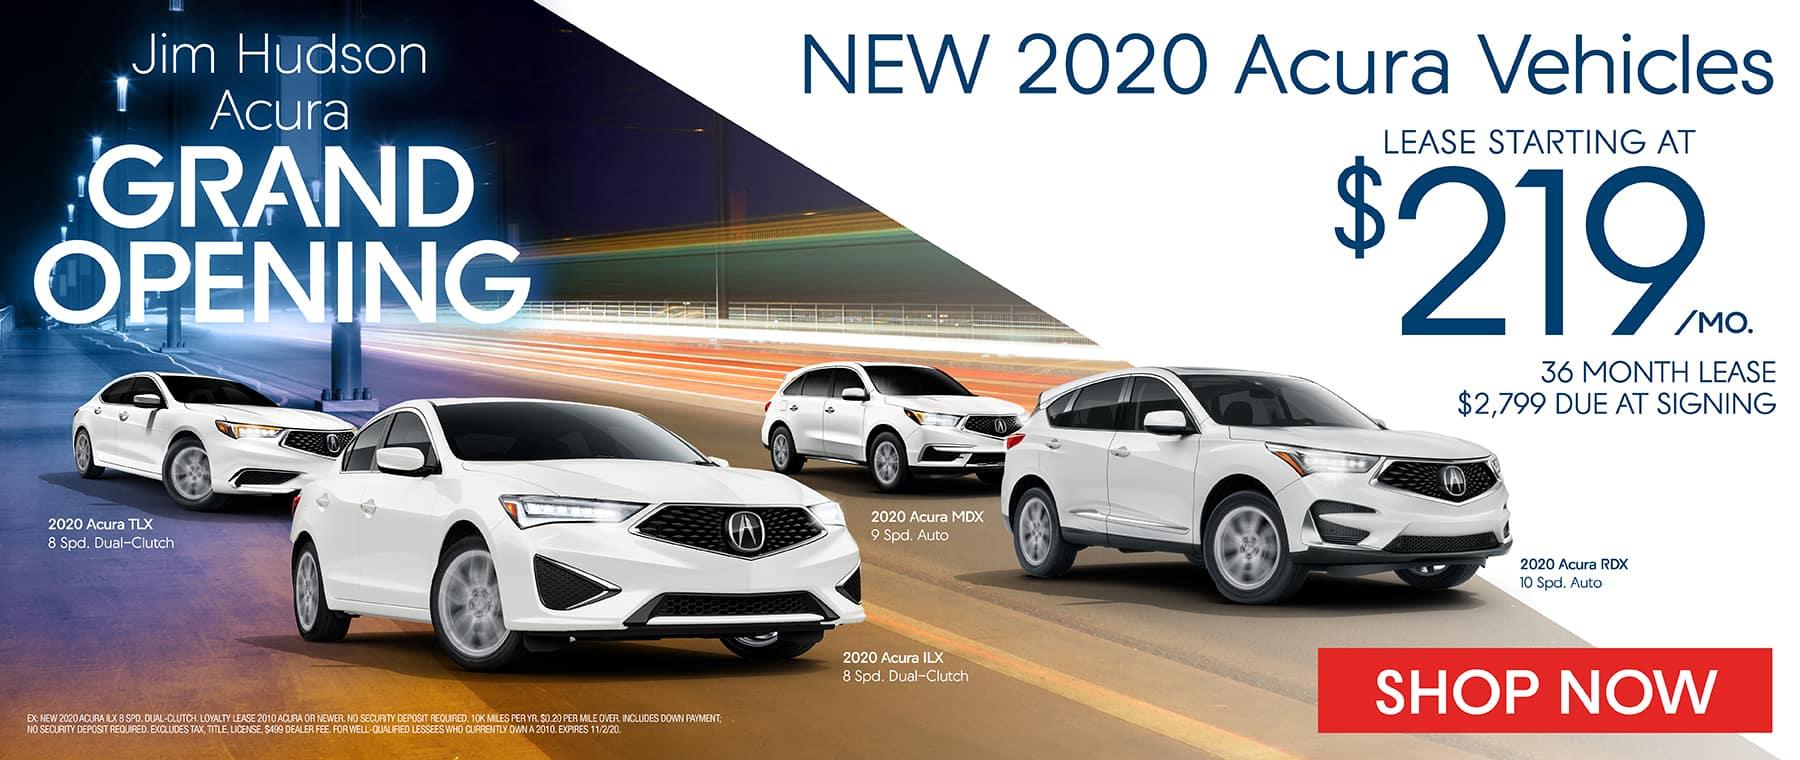 New 2020 Acuras